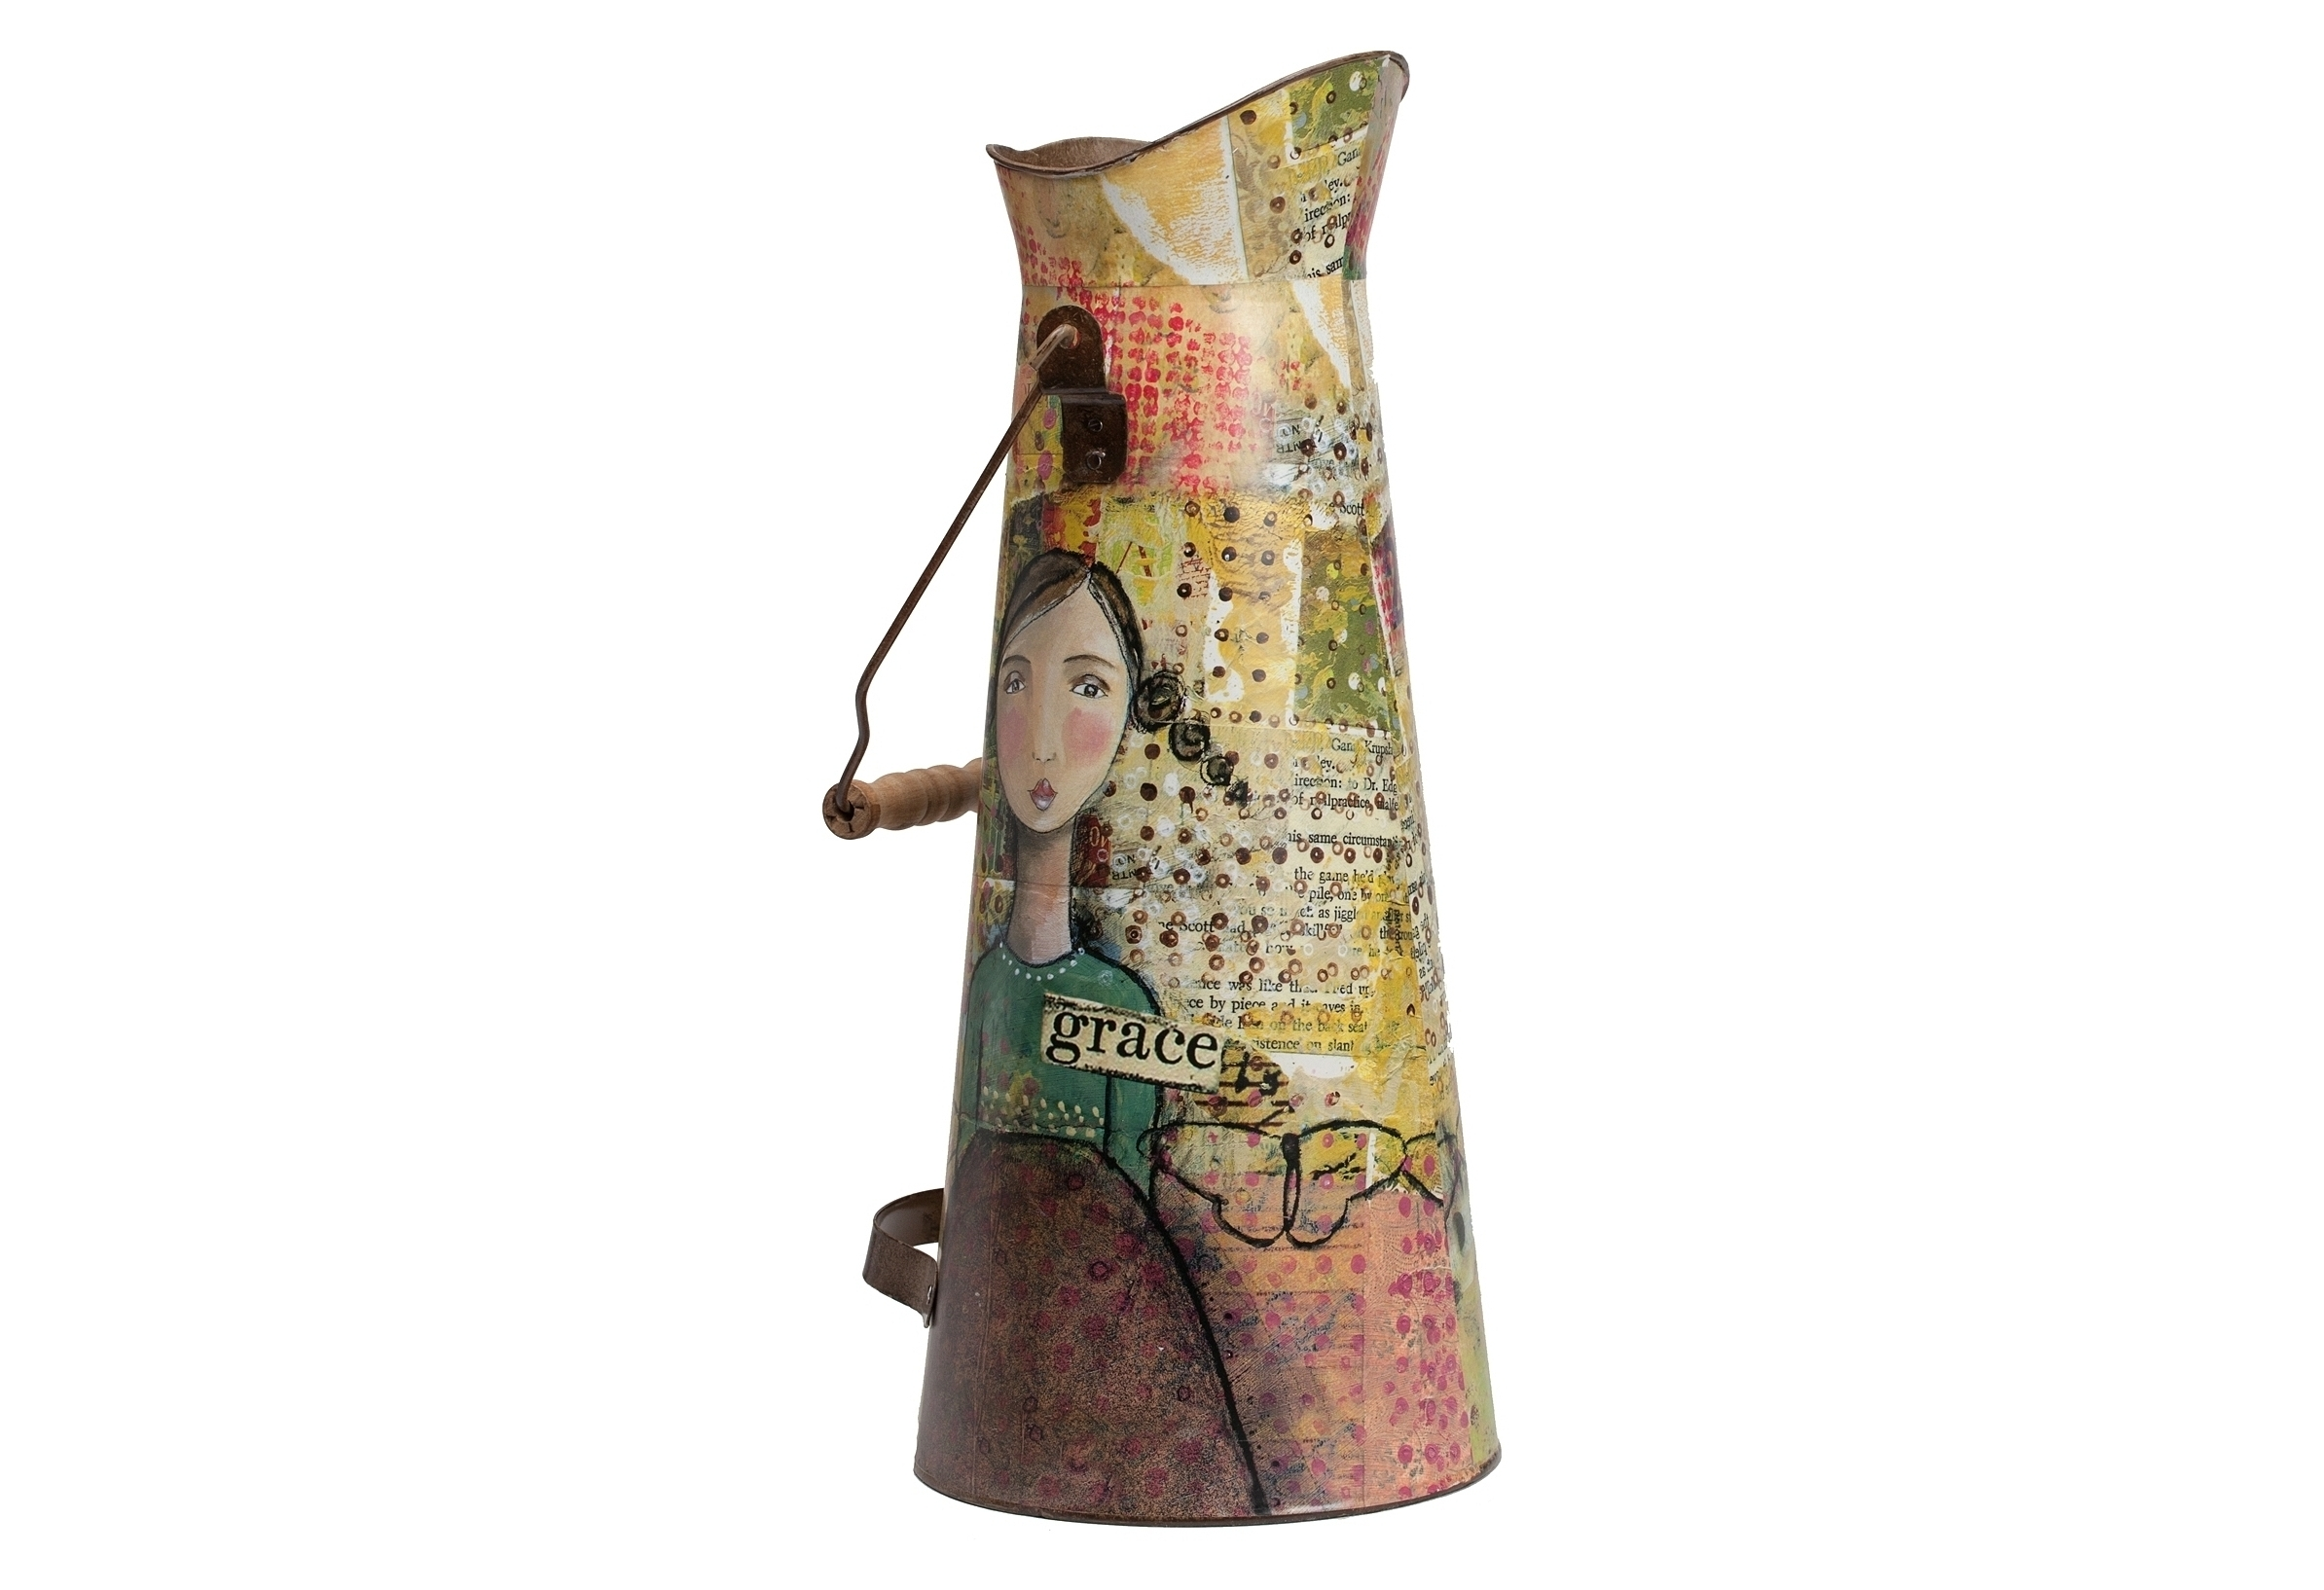 Декоративный кувшин Kelly PoshКувшины и графины<br>Объем 3 литра.<br><br>Material: Металл<br>Height см: 43,5<br>Diameter см: 18,5